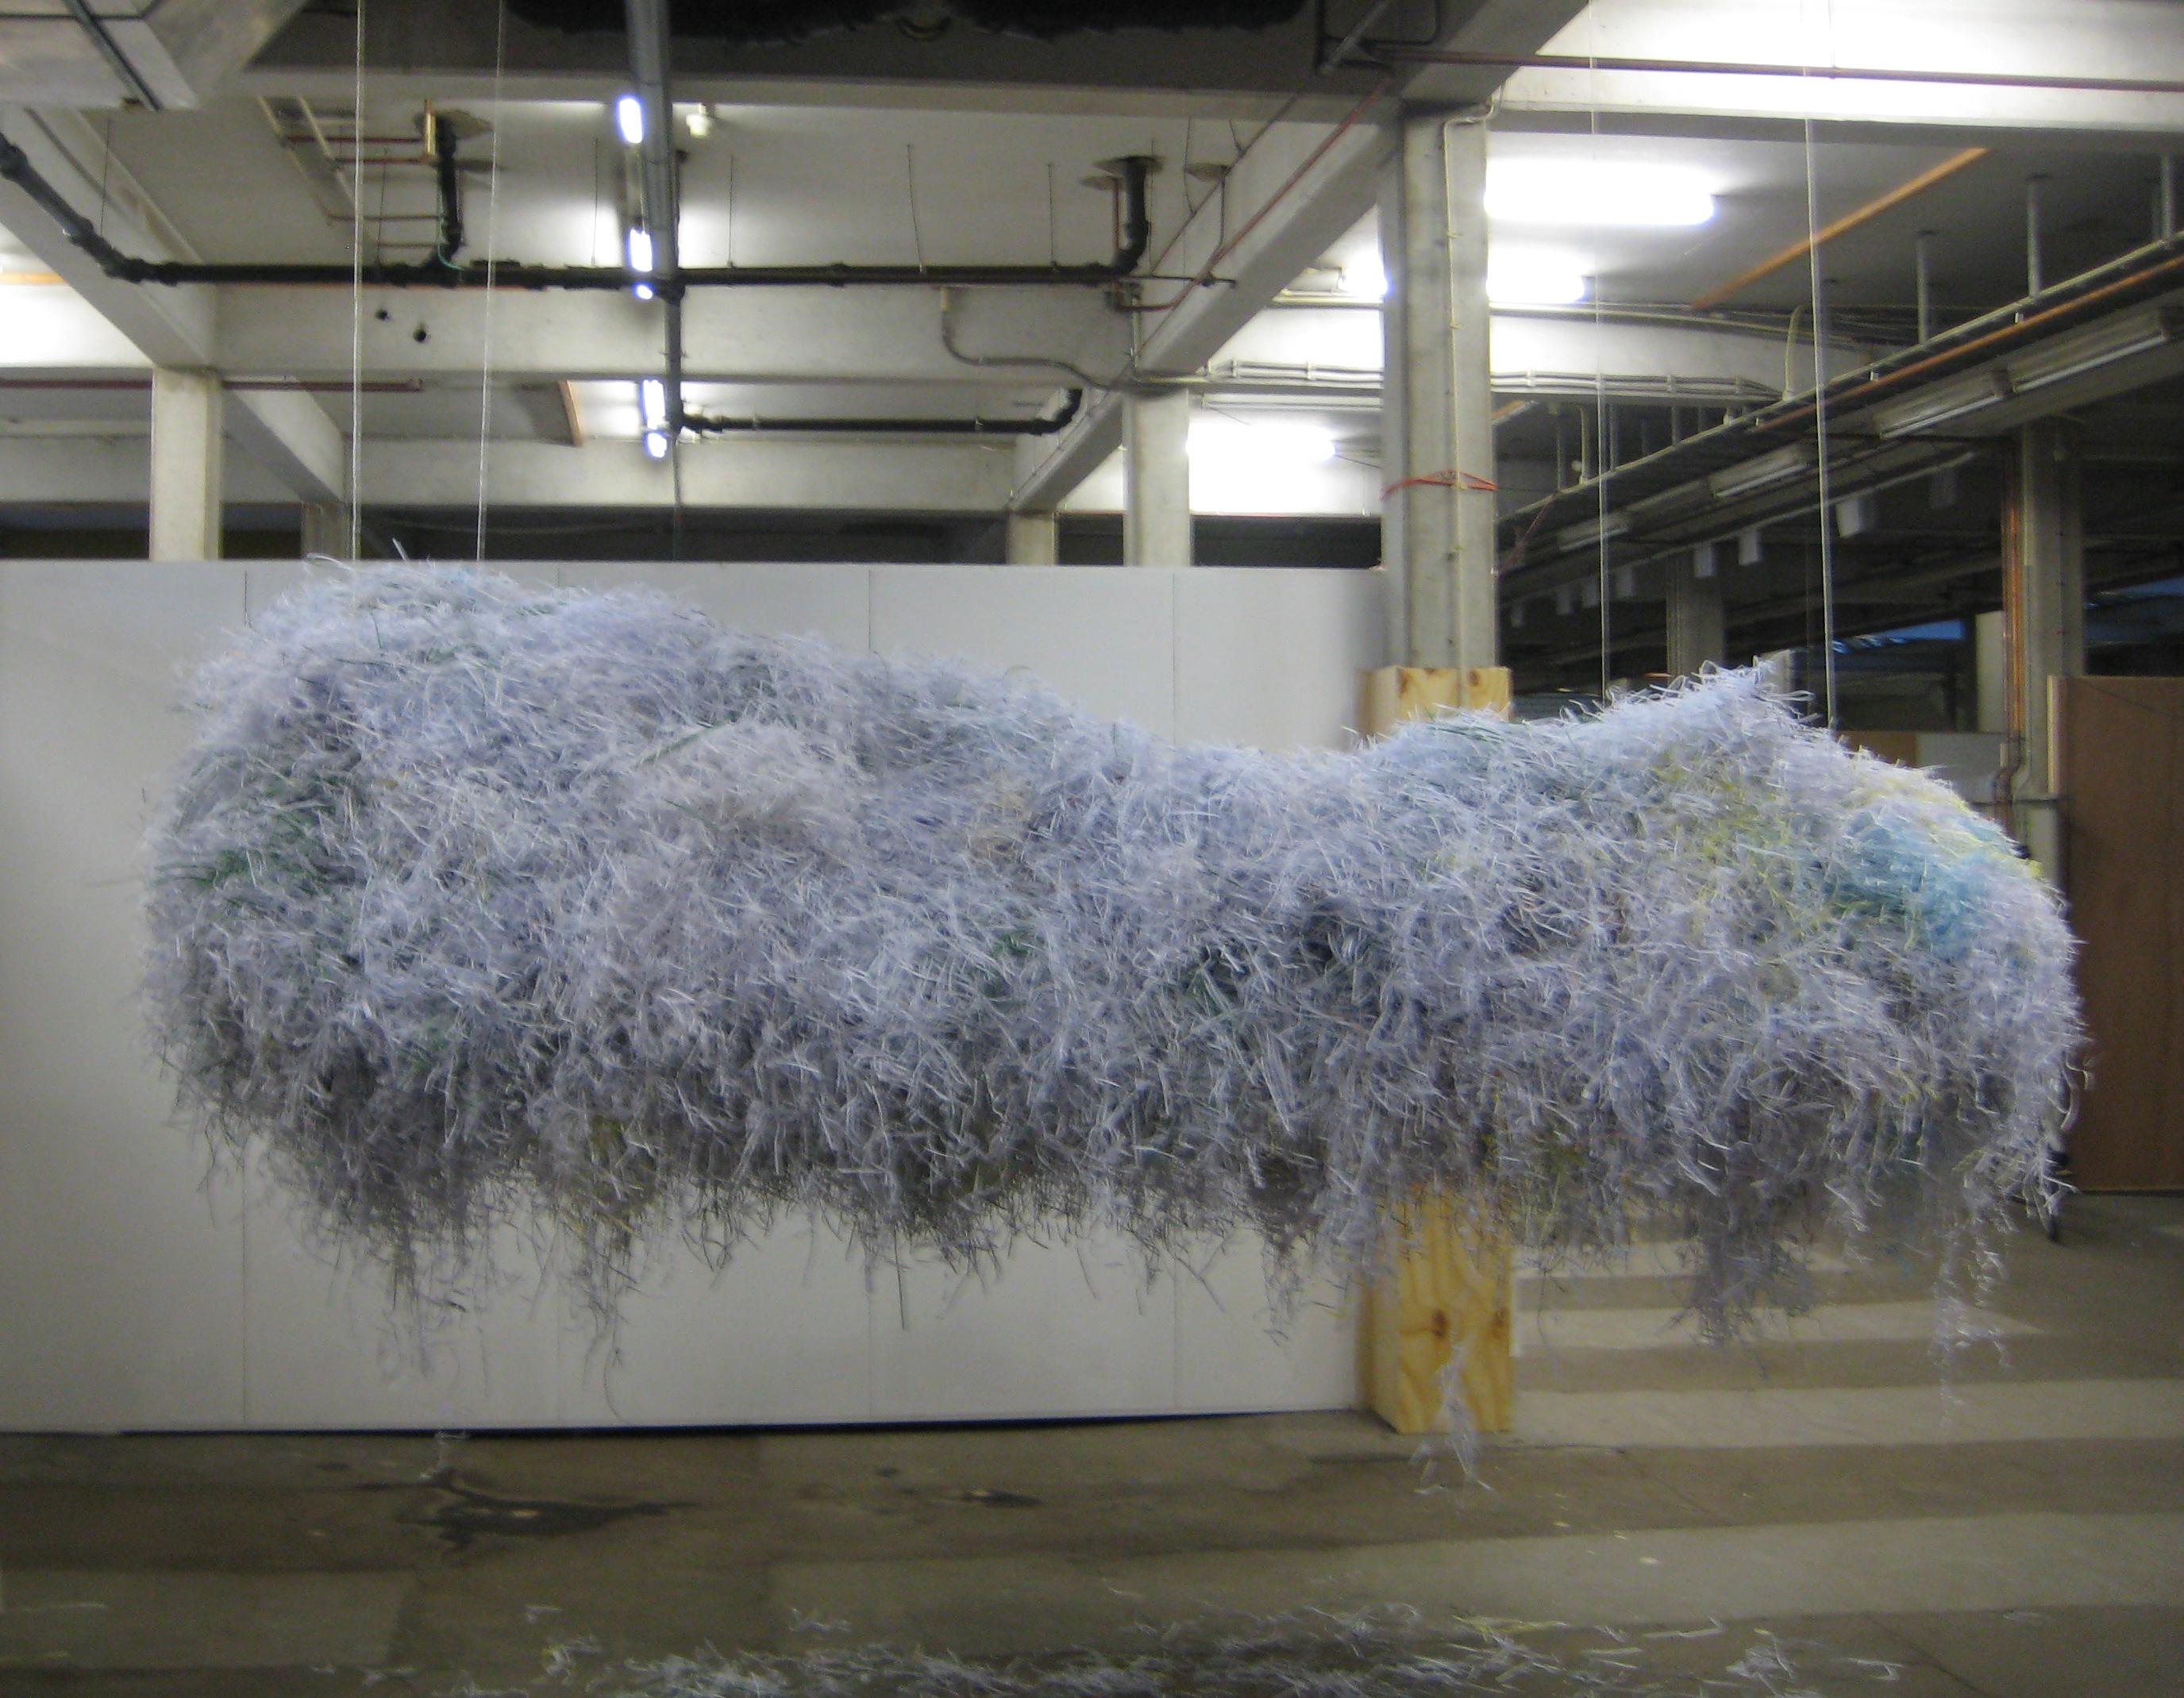 Groningen, Loods zz7, Wolk, 2010, papierstroken, frame